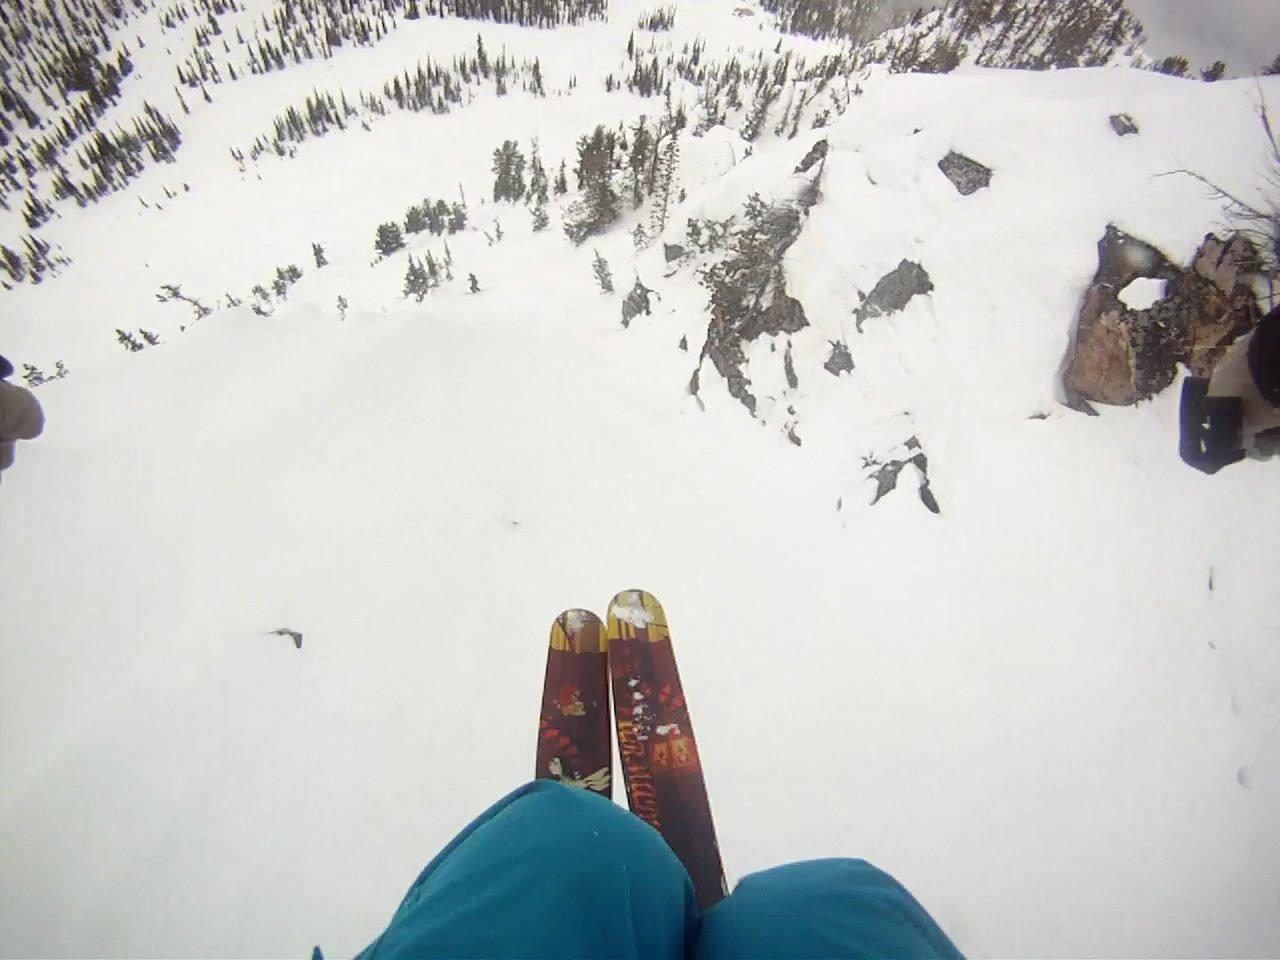 Kicking horse, big cliff to narrow chute